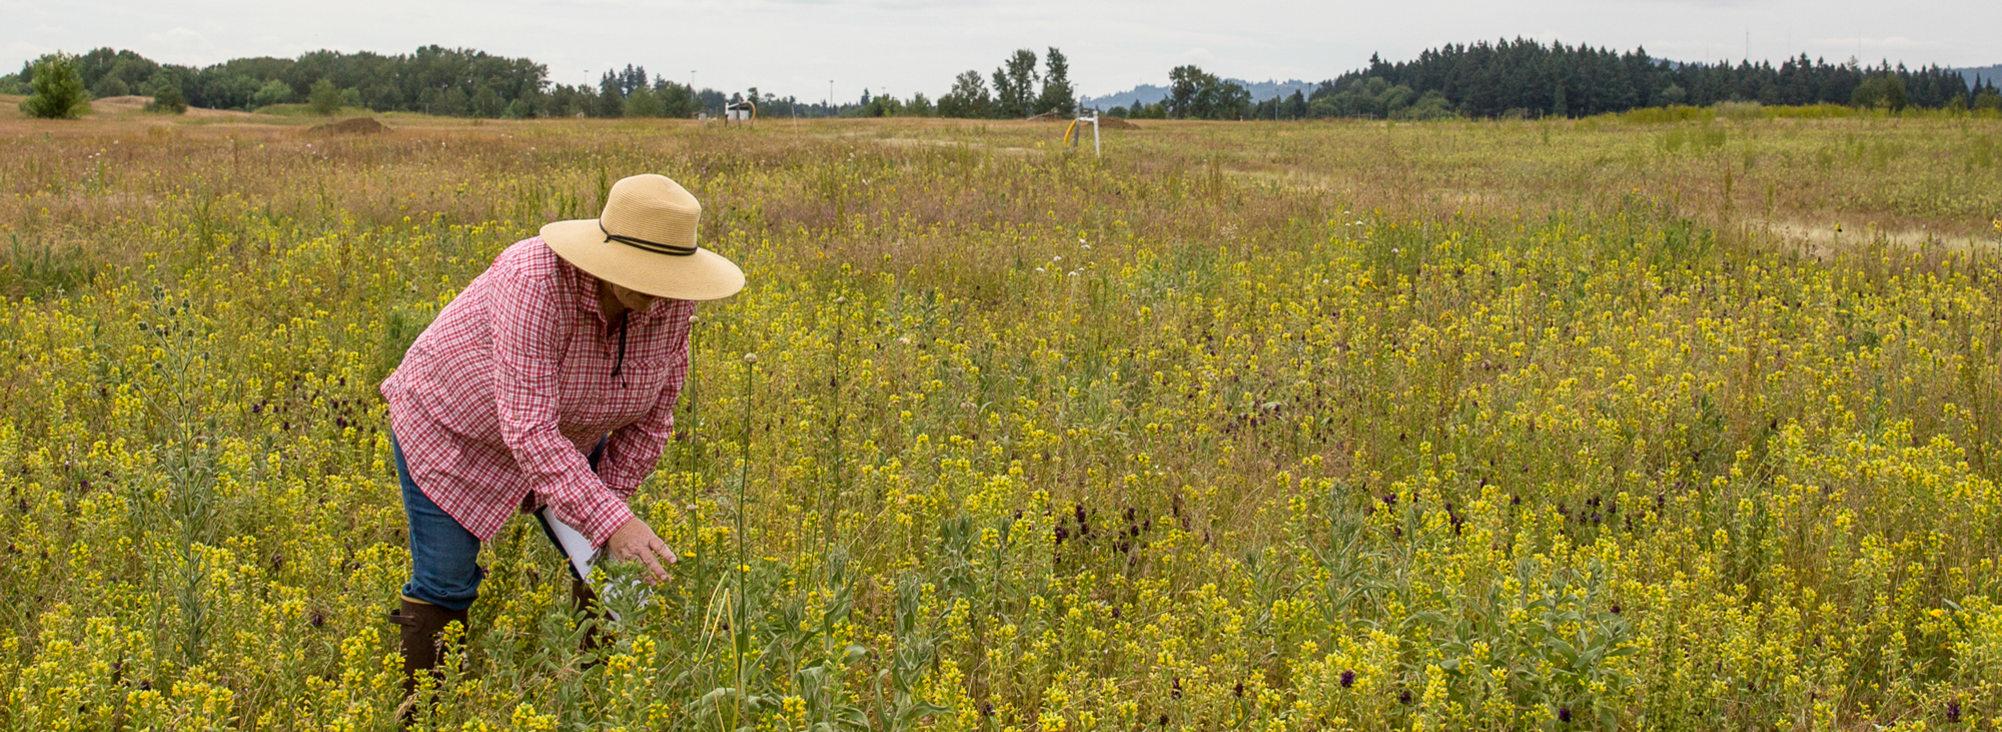 Metro scientist in a field of wildflowers at St. Johns Prairie